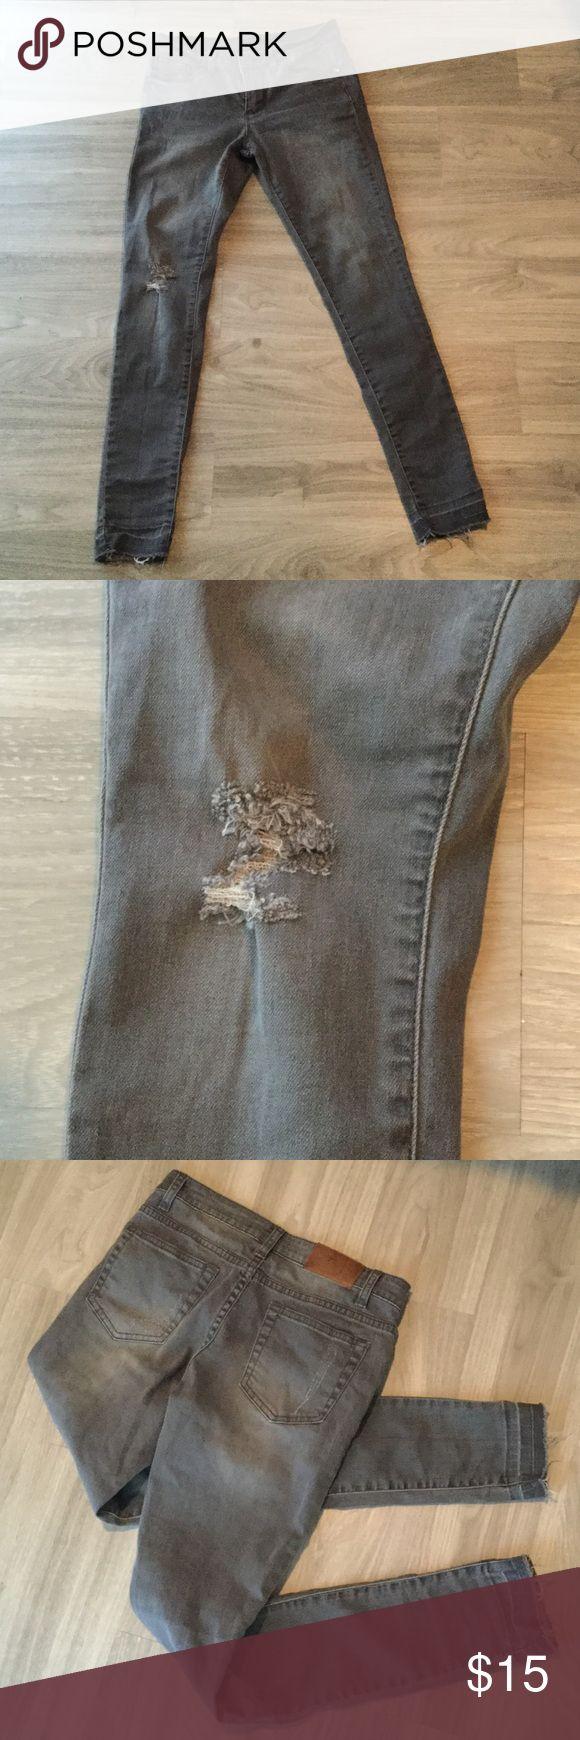 Harper - grey distressed skinny jeans, 26 Harper - grey distressed skinny jeans, women's size 26. harper Jeans Skinny